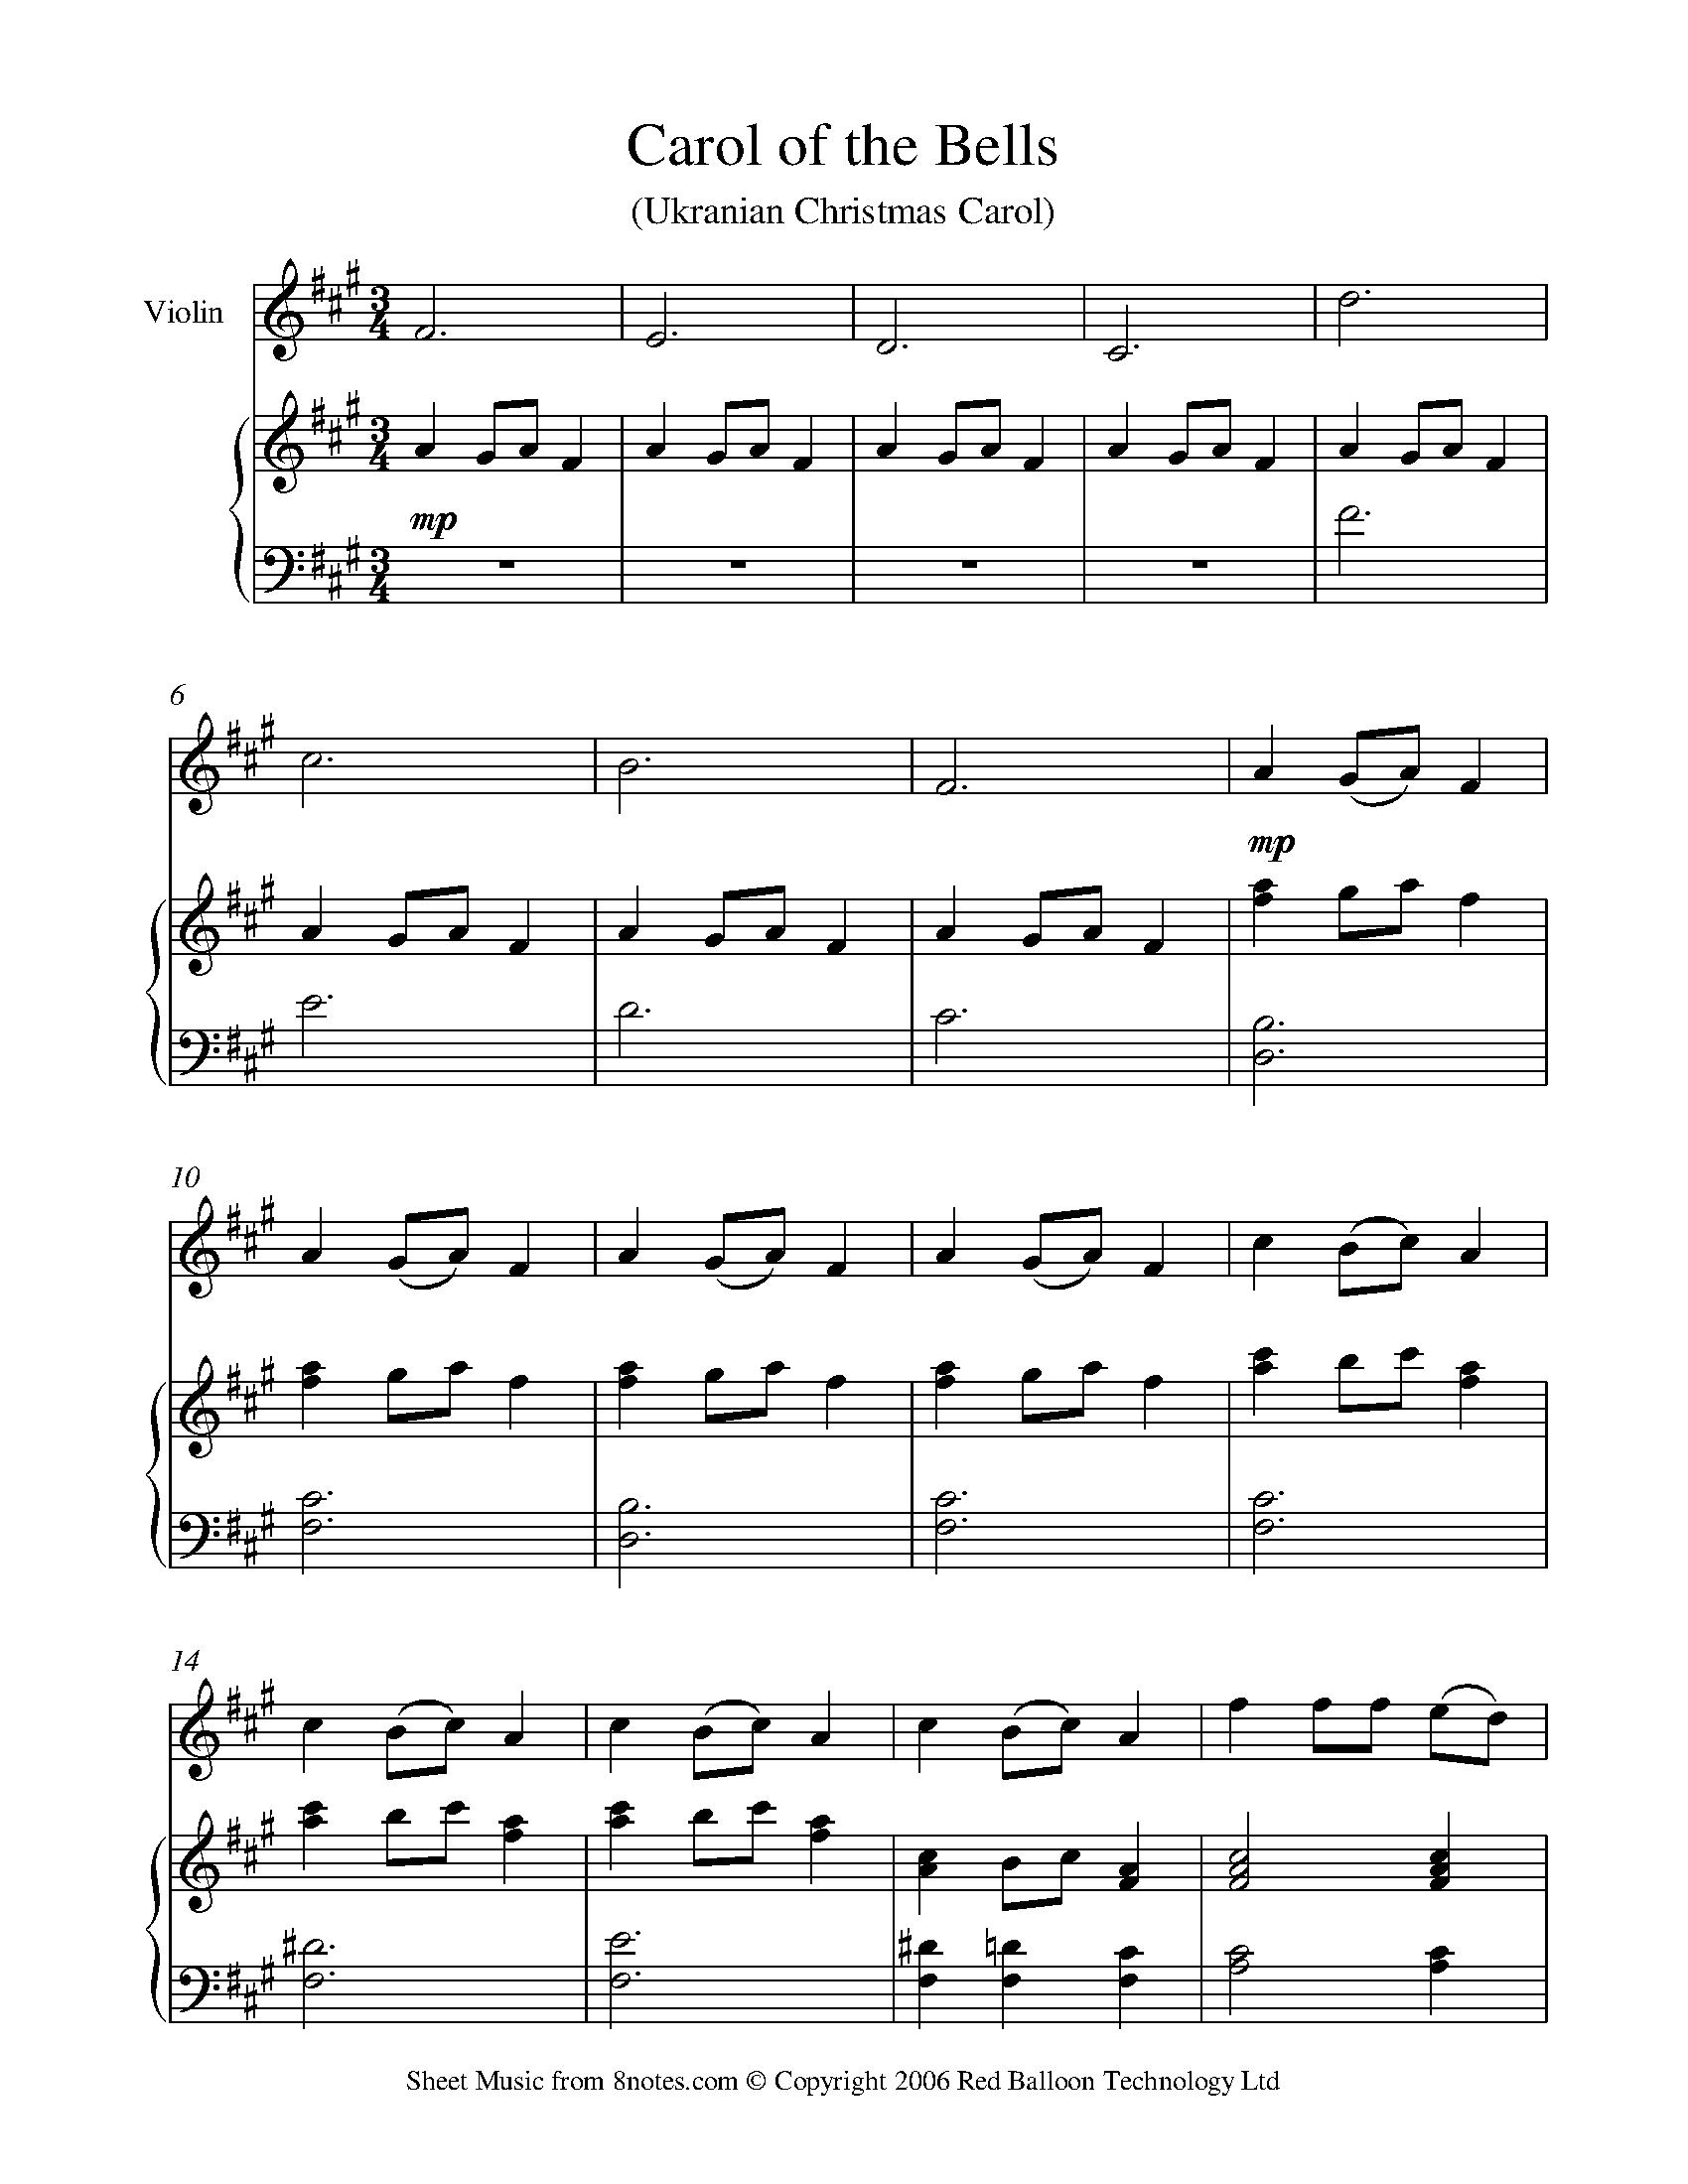 image regarding Carol of the Bells Free Printable Sheet Music known as Carol of the Bells sheet new music for Violin -